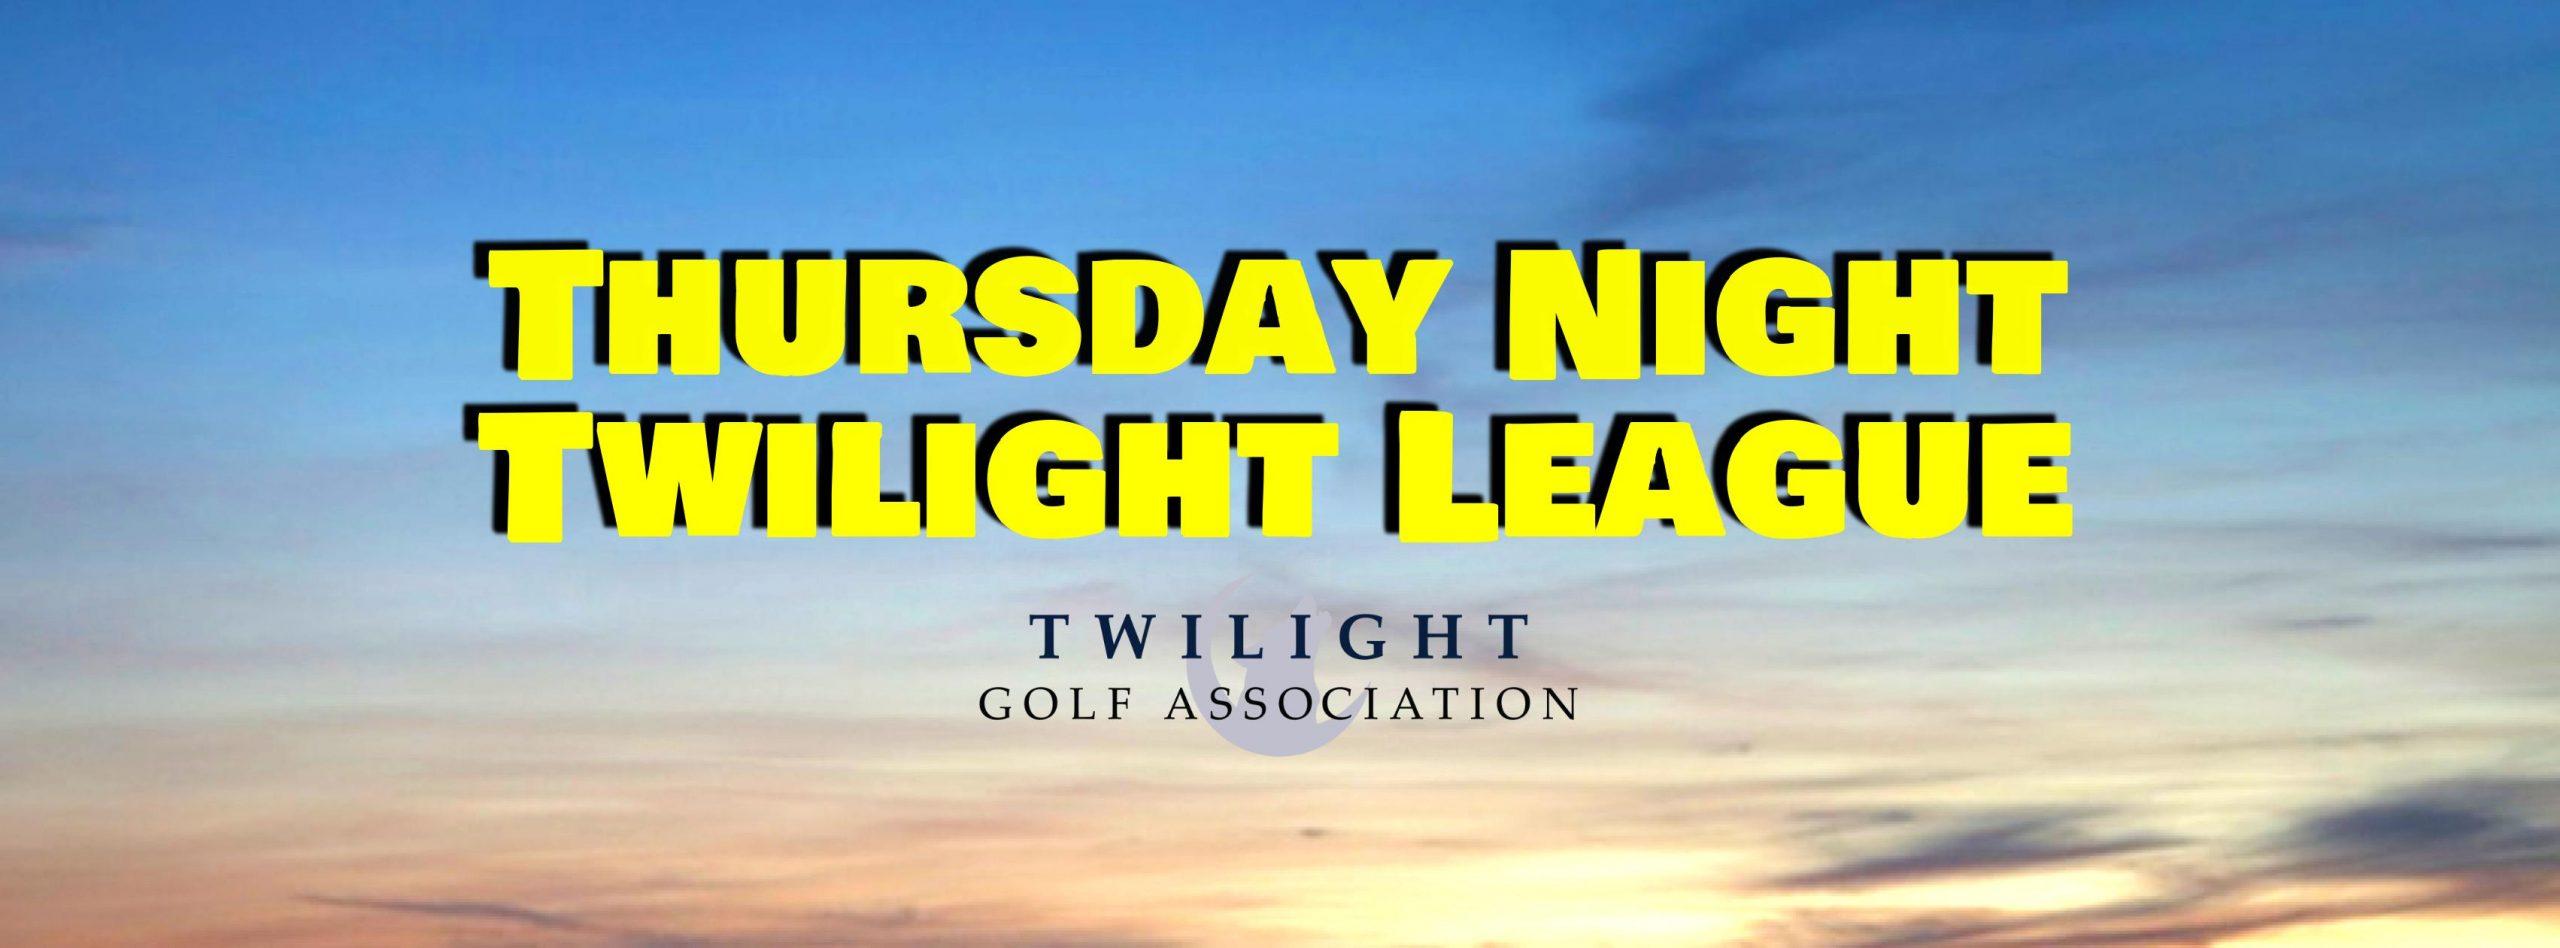 Thursday Twilight League at Waverly Woods Golf Club